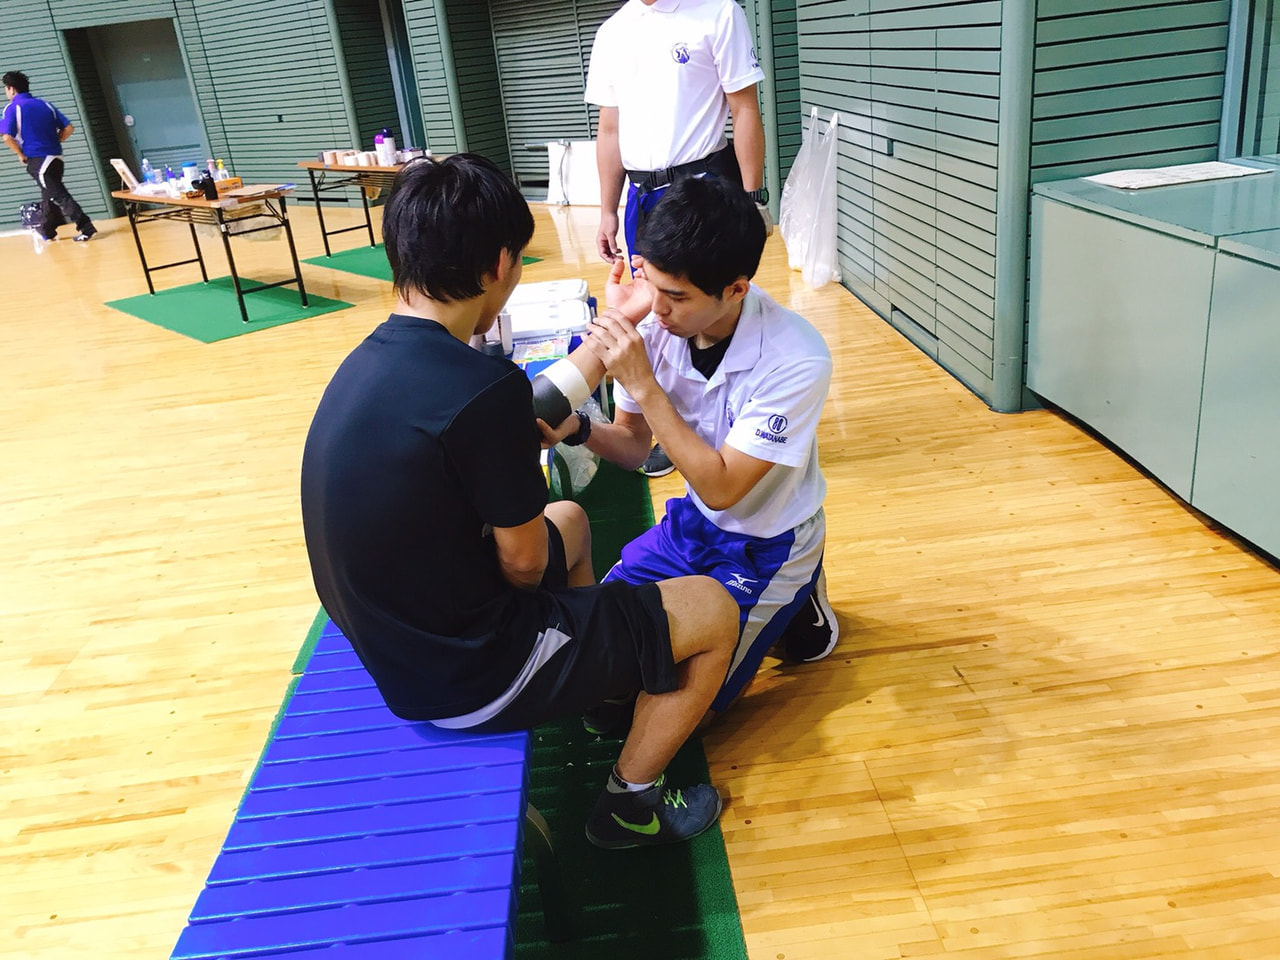 全日本学生レスリング選手権大会 救護 3日目